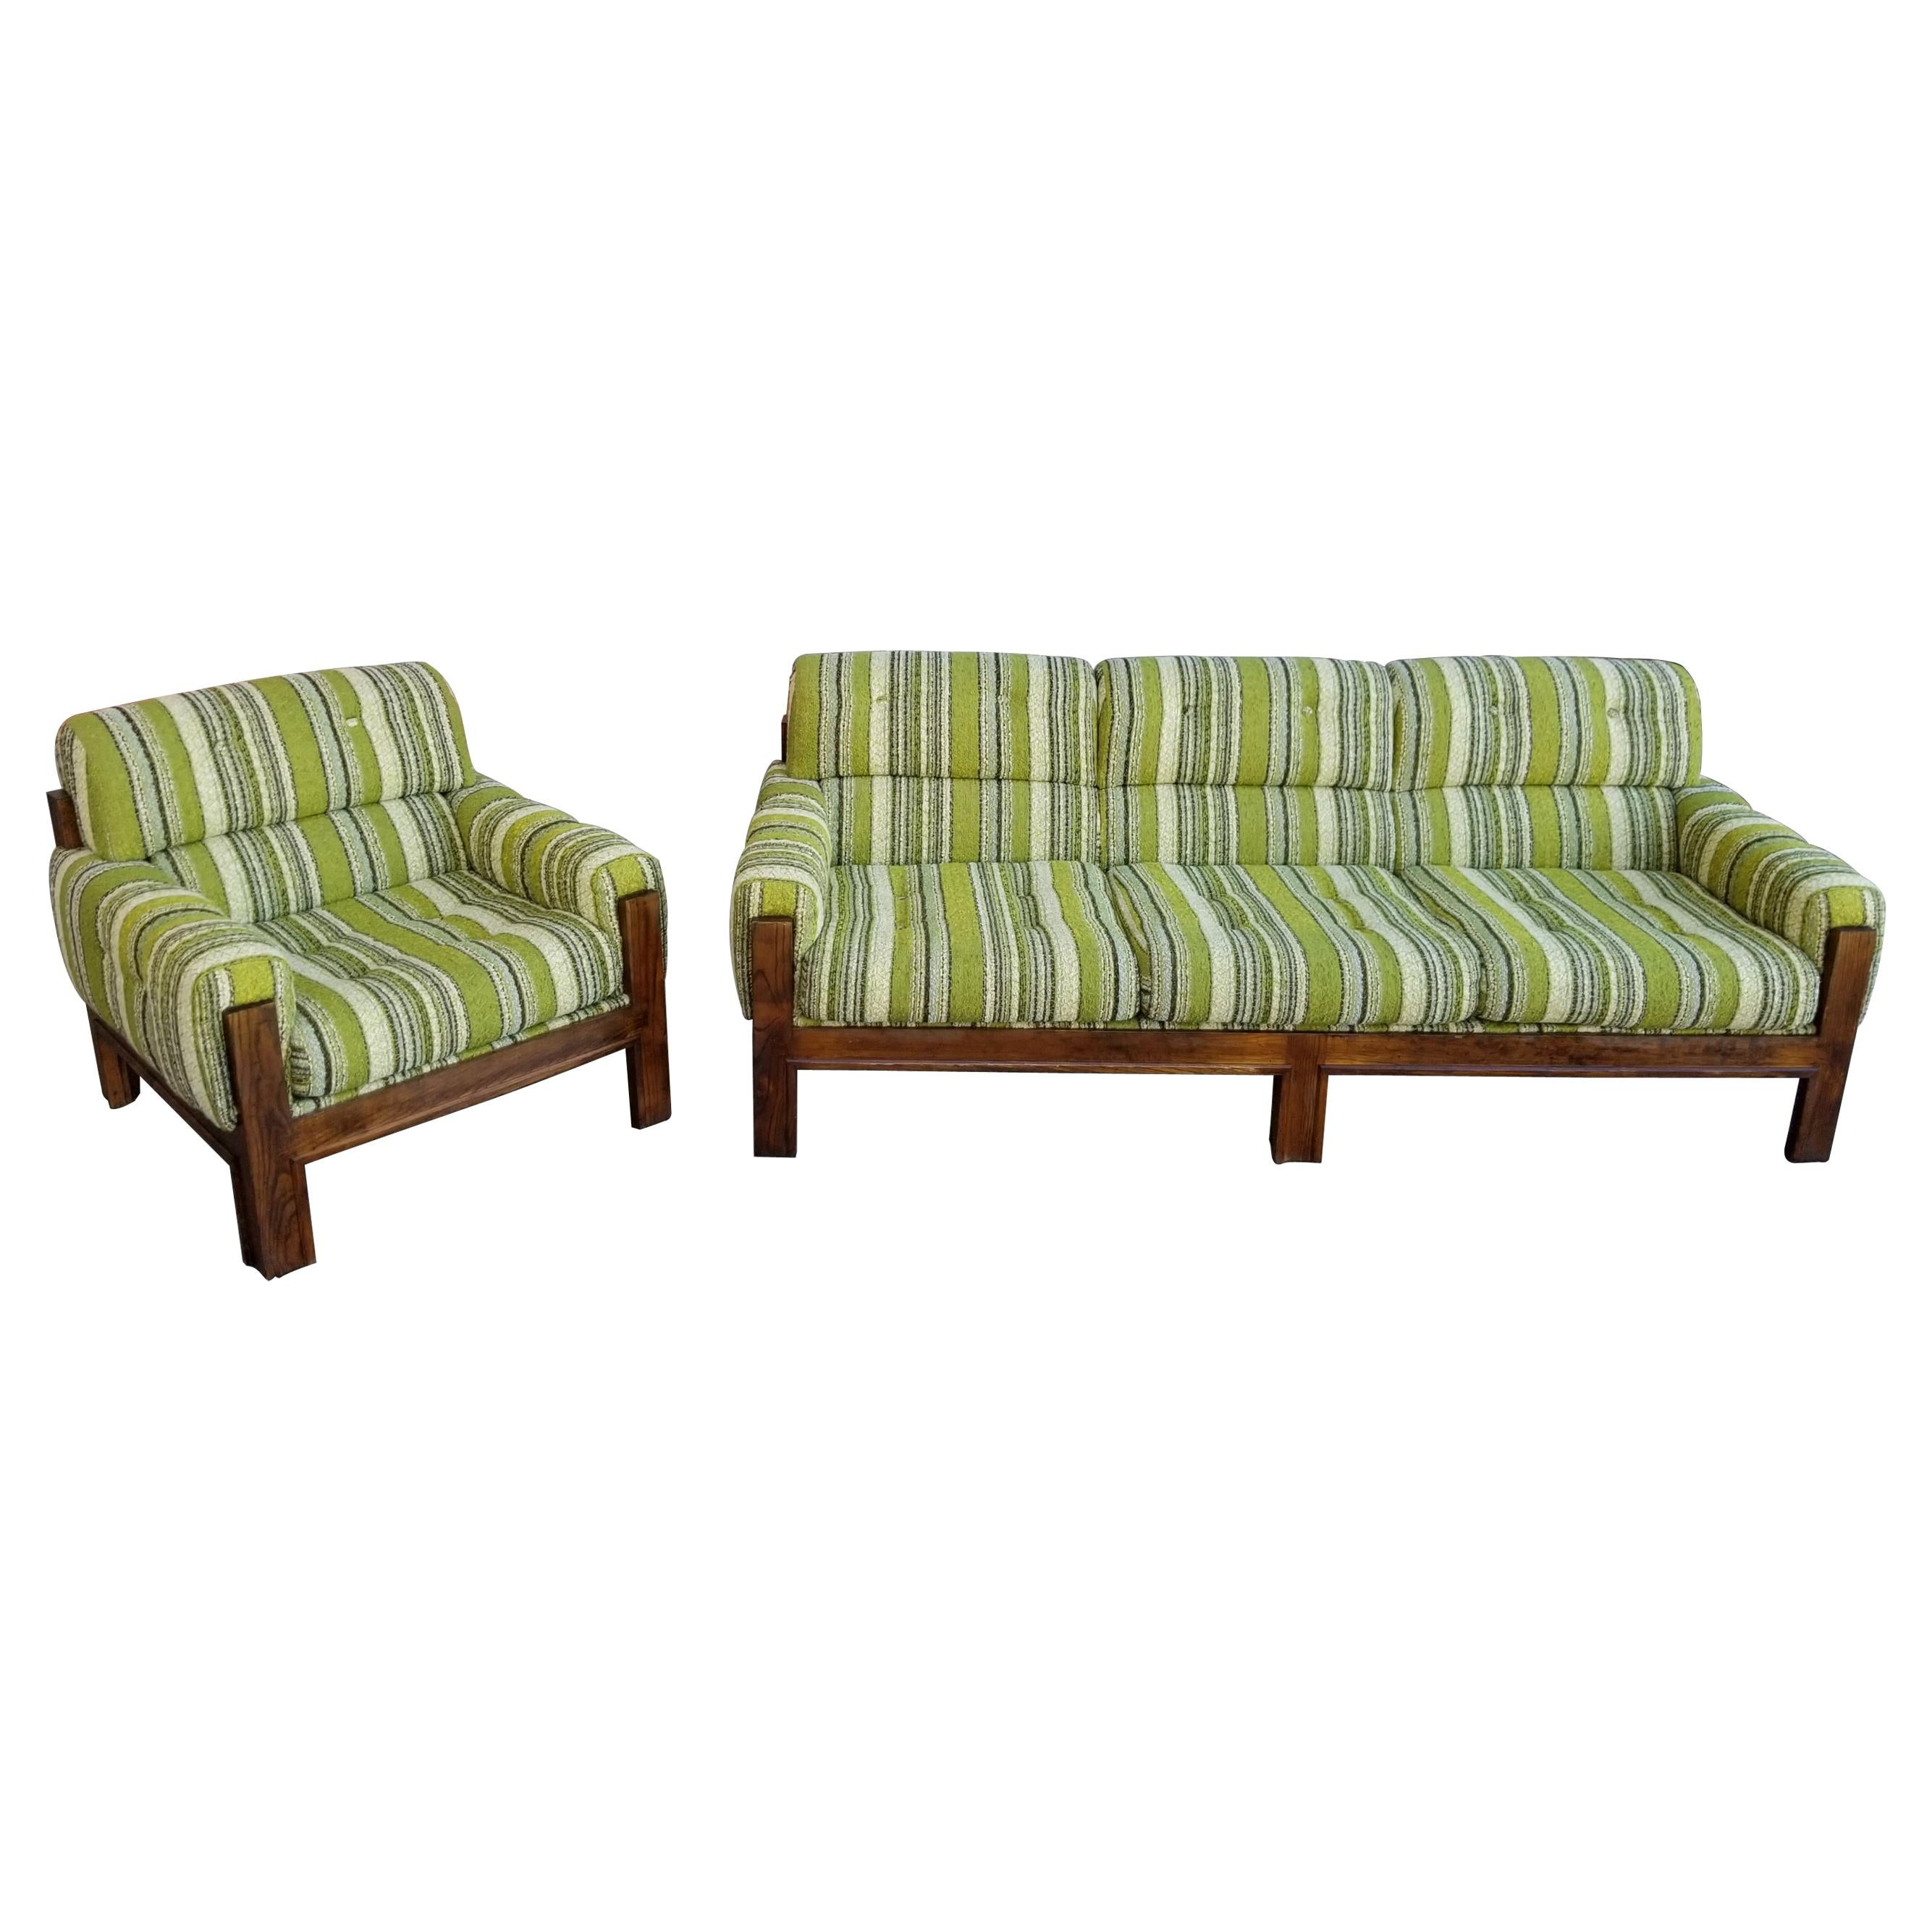 1970s Mod Sofa and Lounge Chair Set